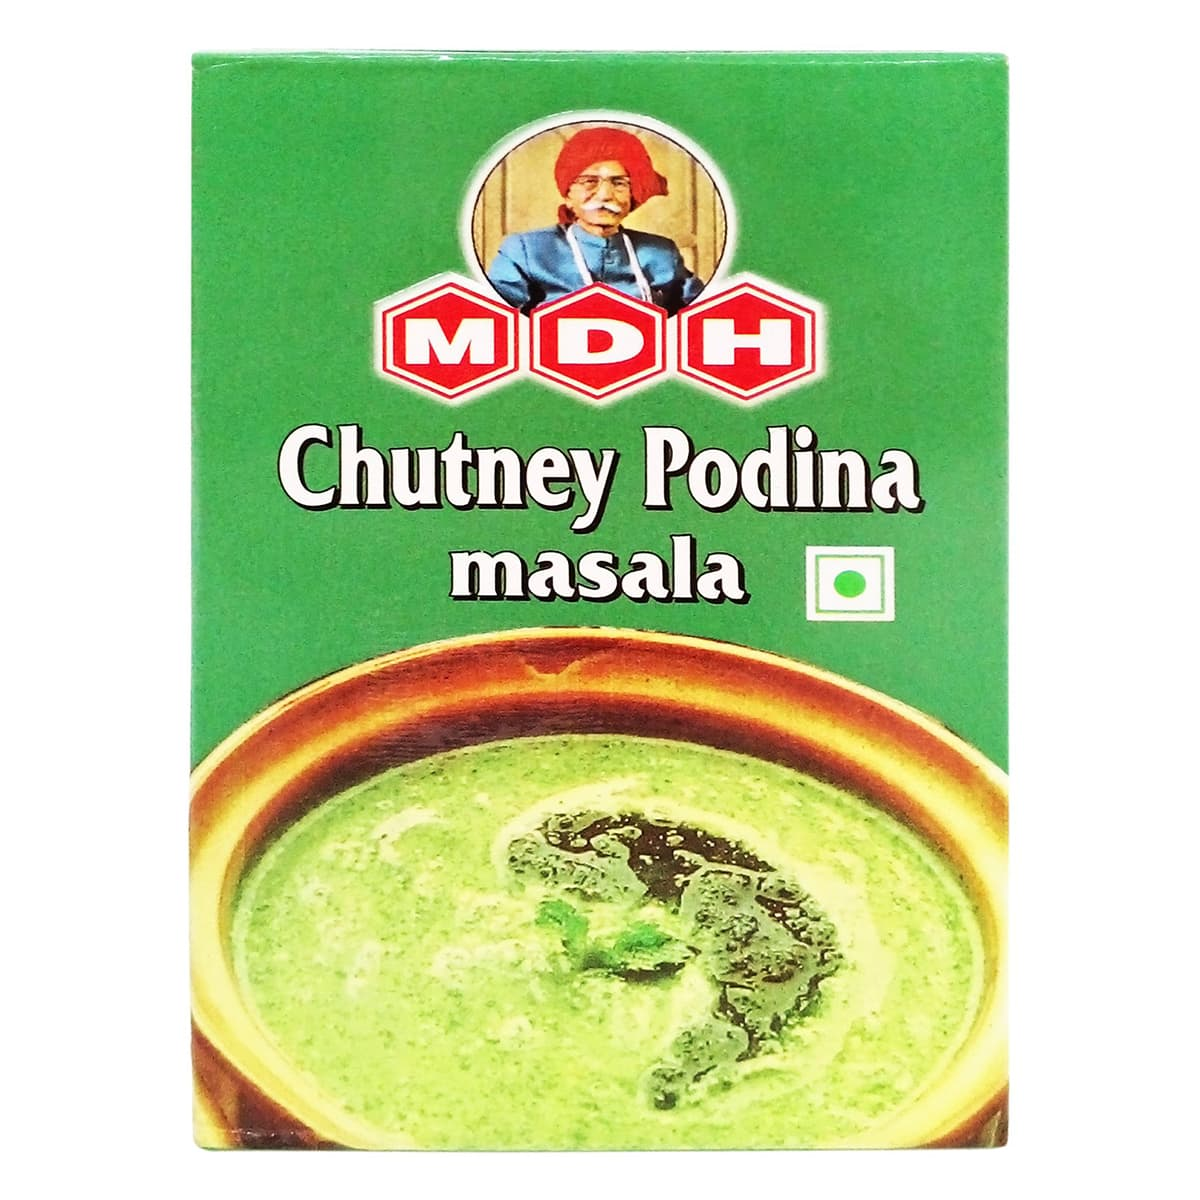 Buy MDH Chutney Podina Masala - 100 gm